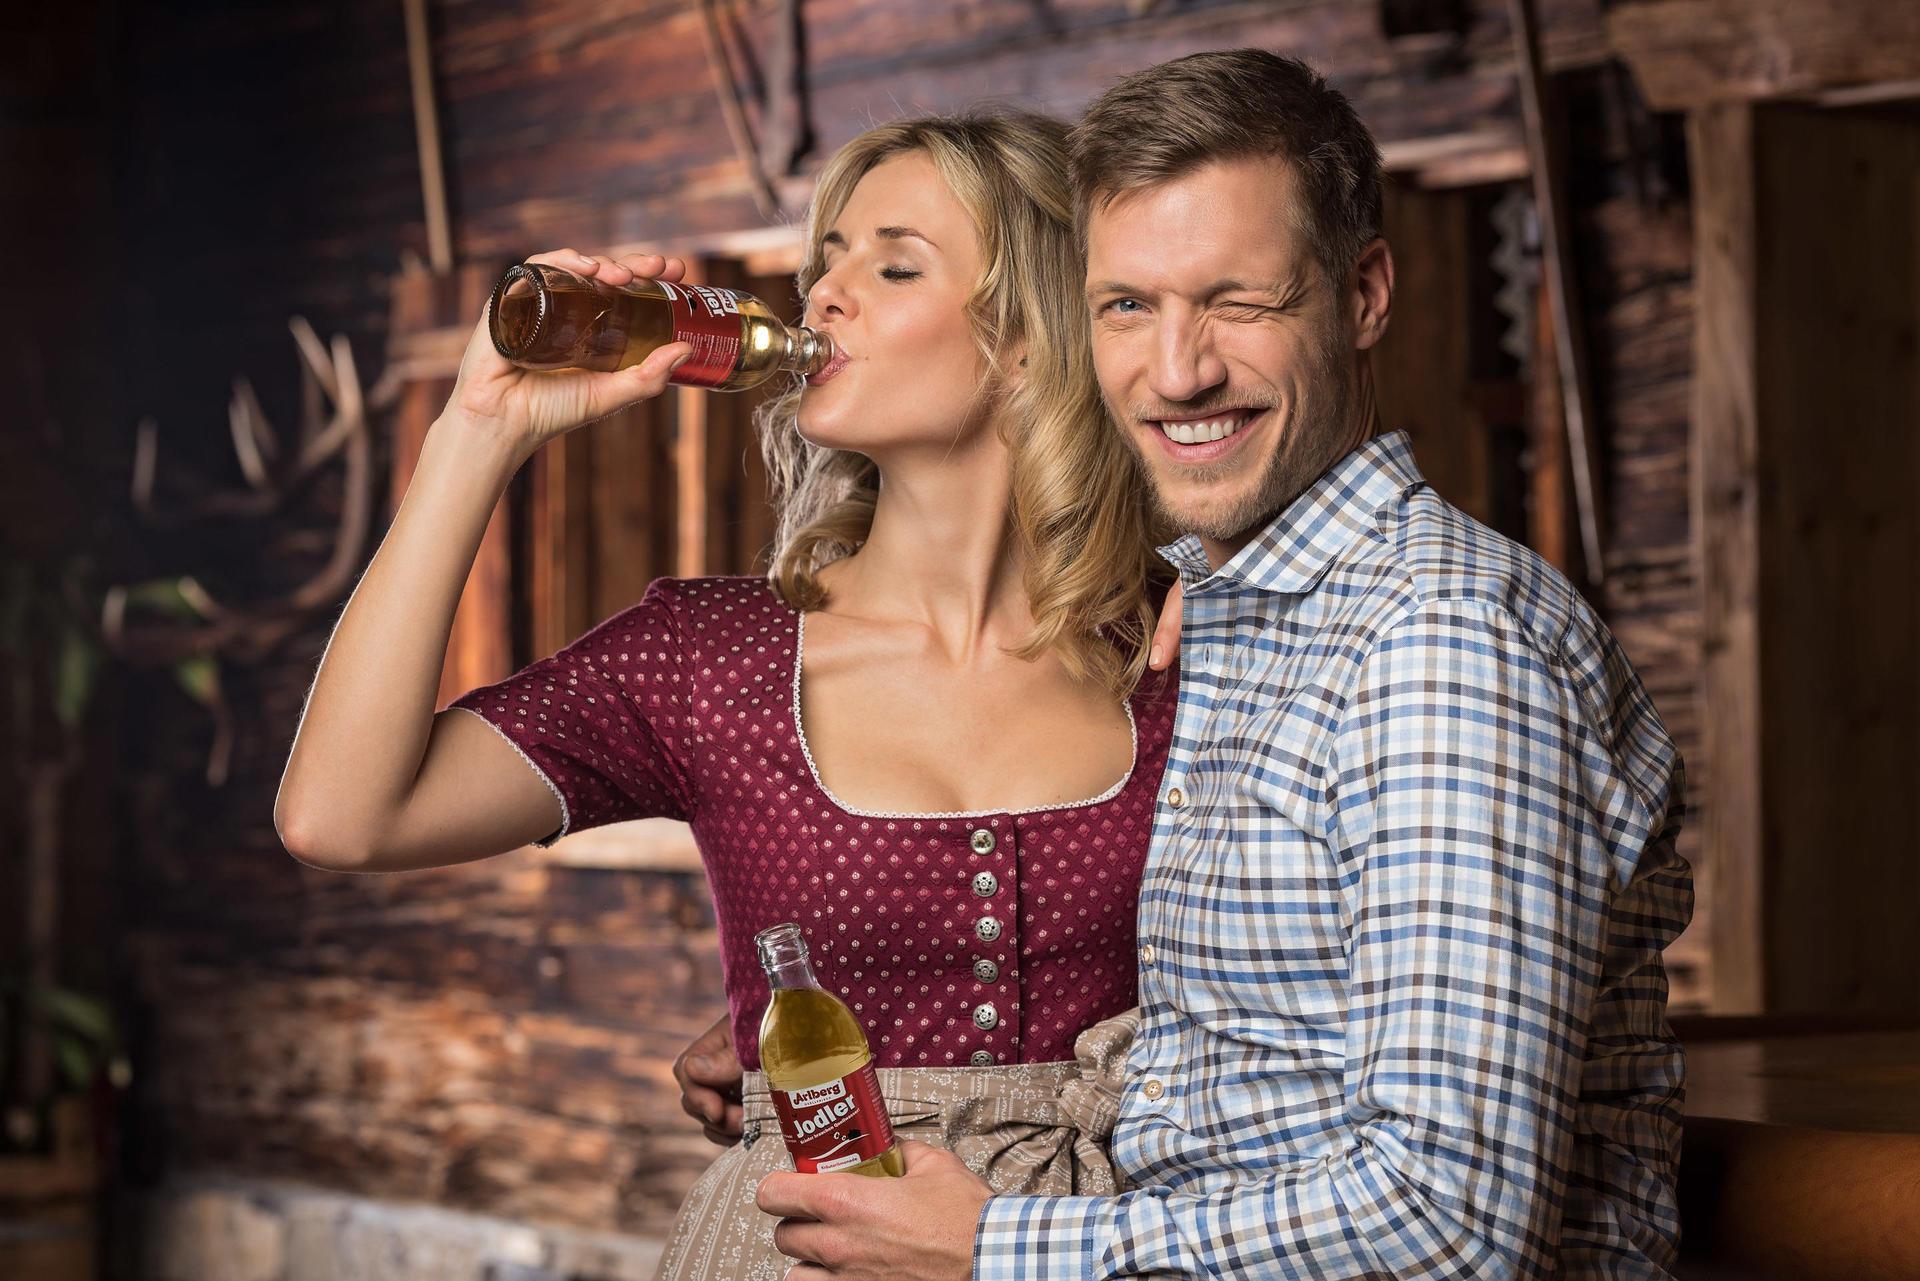 bertolini-photo-arlberg-limonaden-jodler-3-von-3